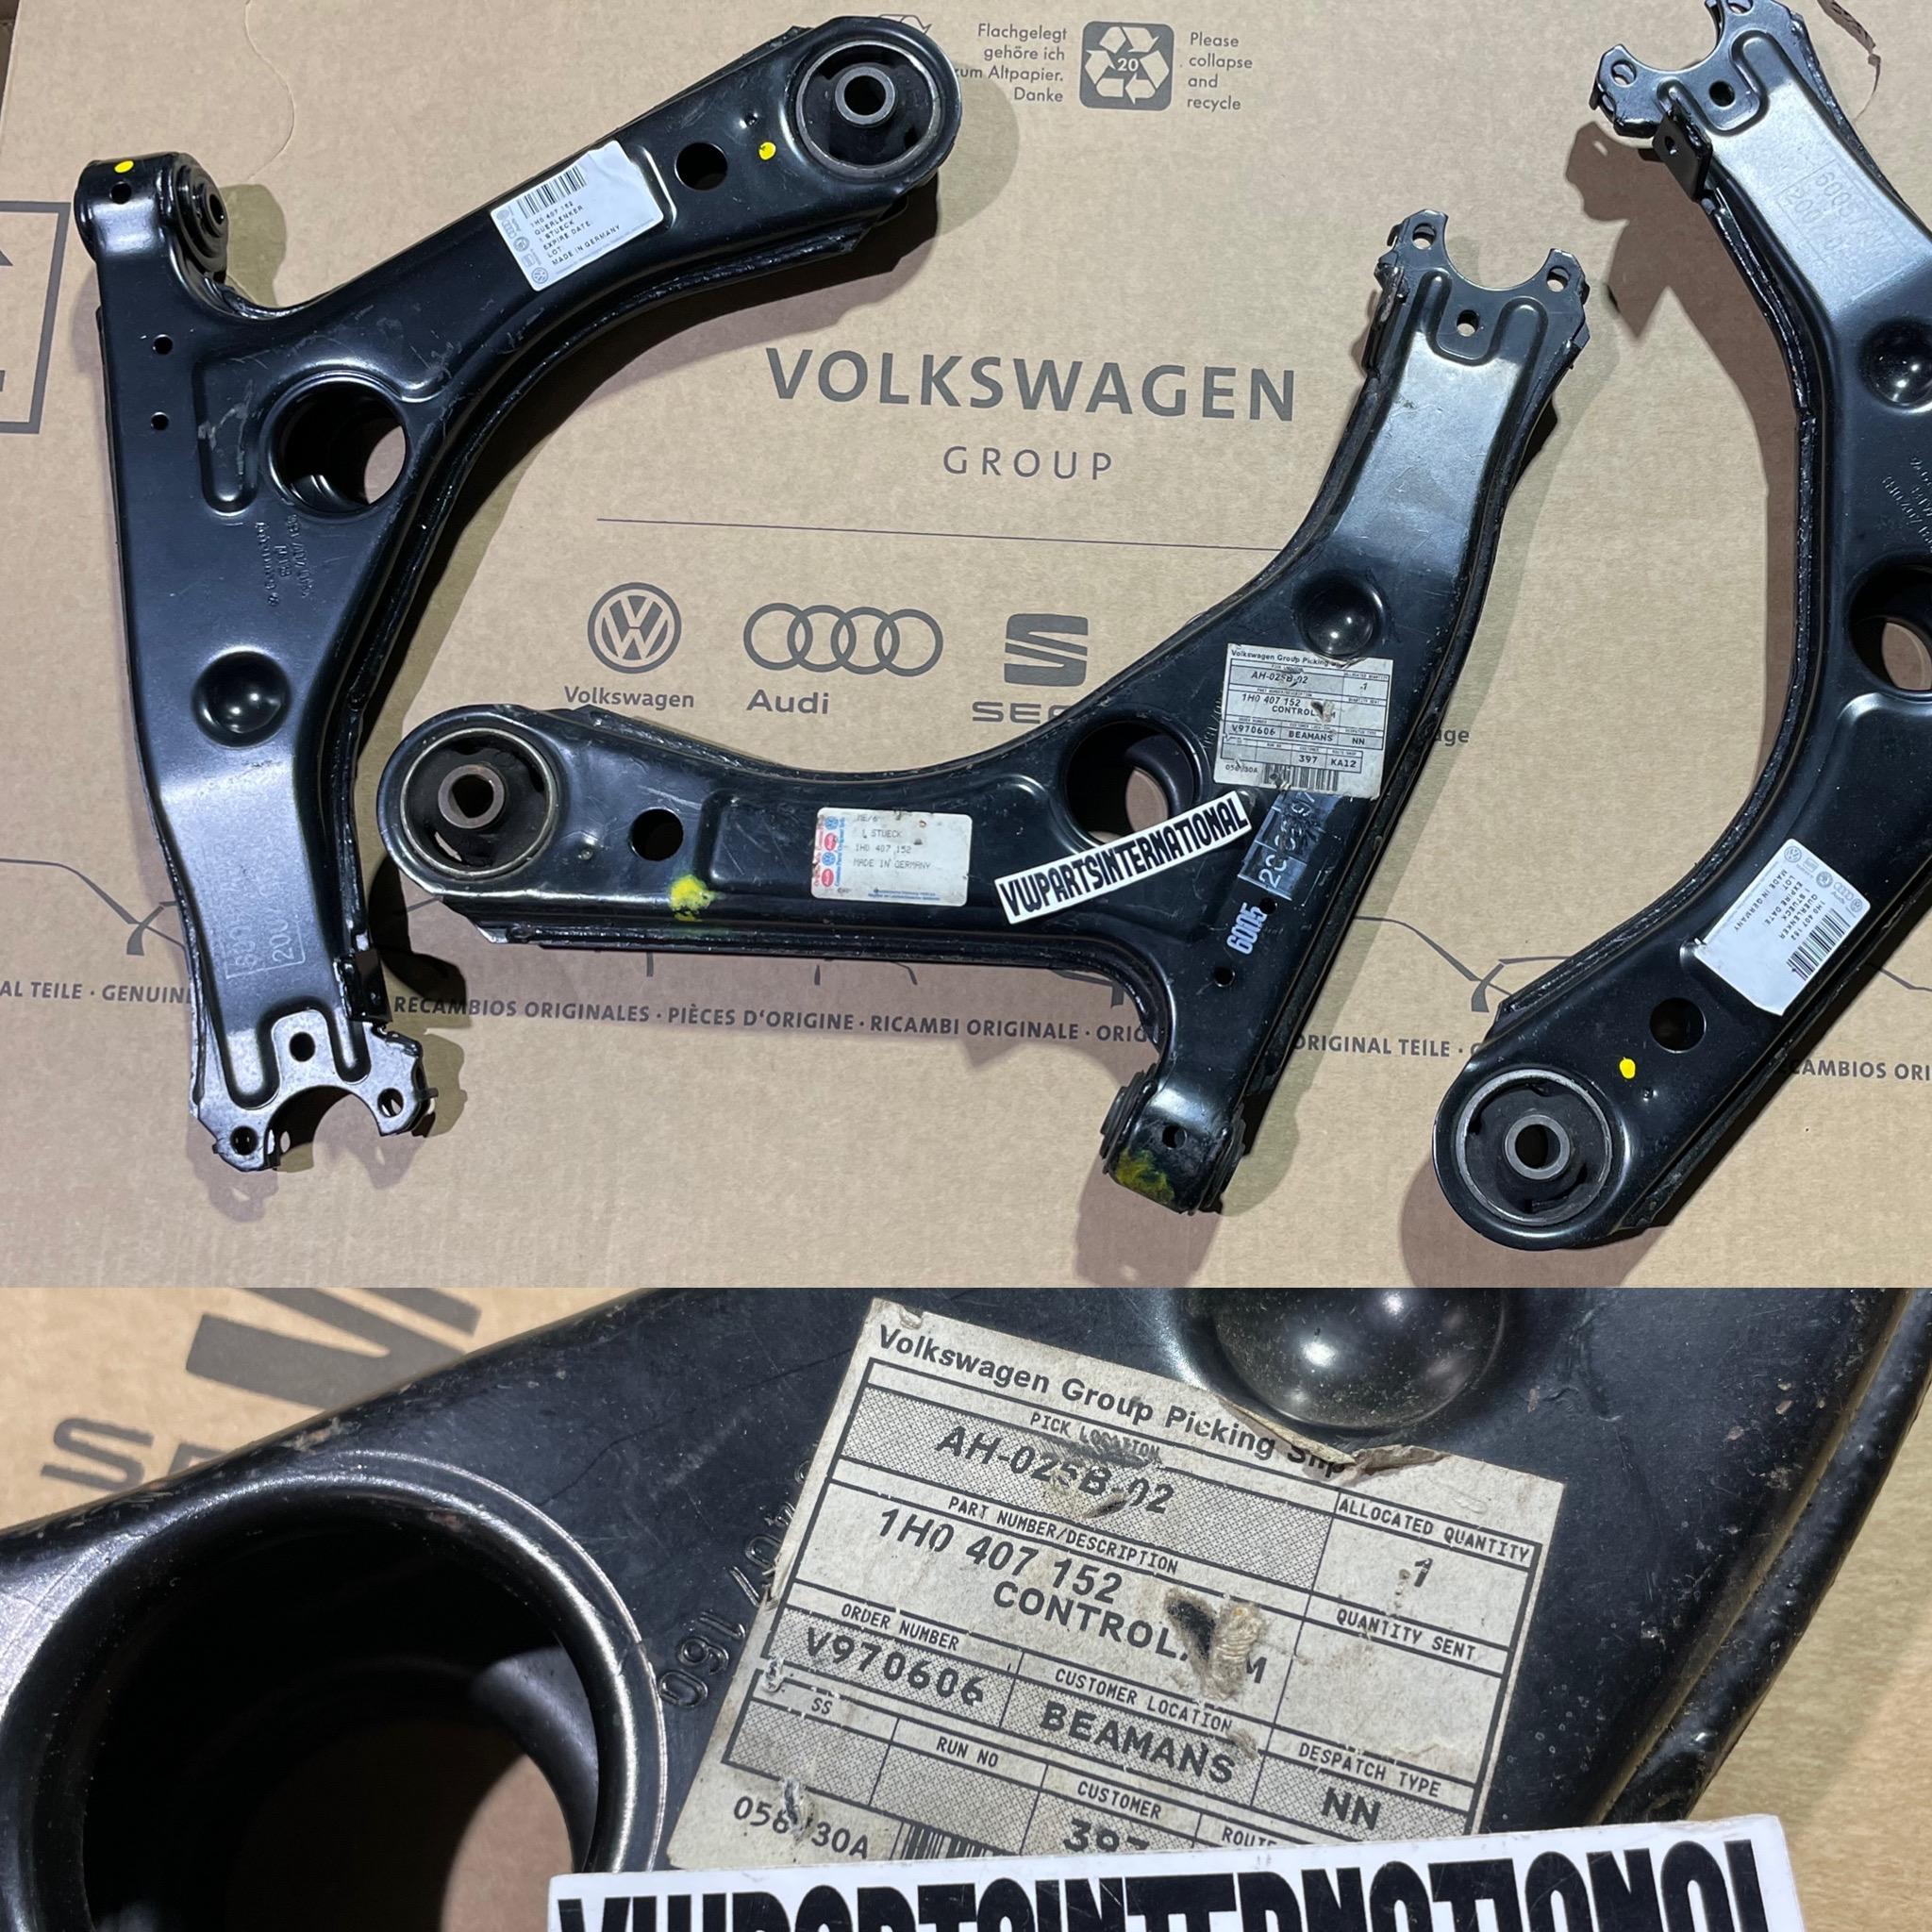 Volkswagen Golf Genuine OEM Parts For Sale, Restore it, Enjoy it. Everything Starts With A Wish